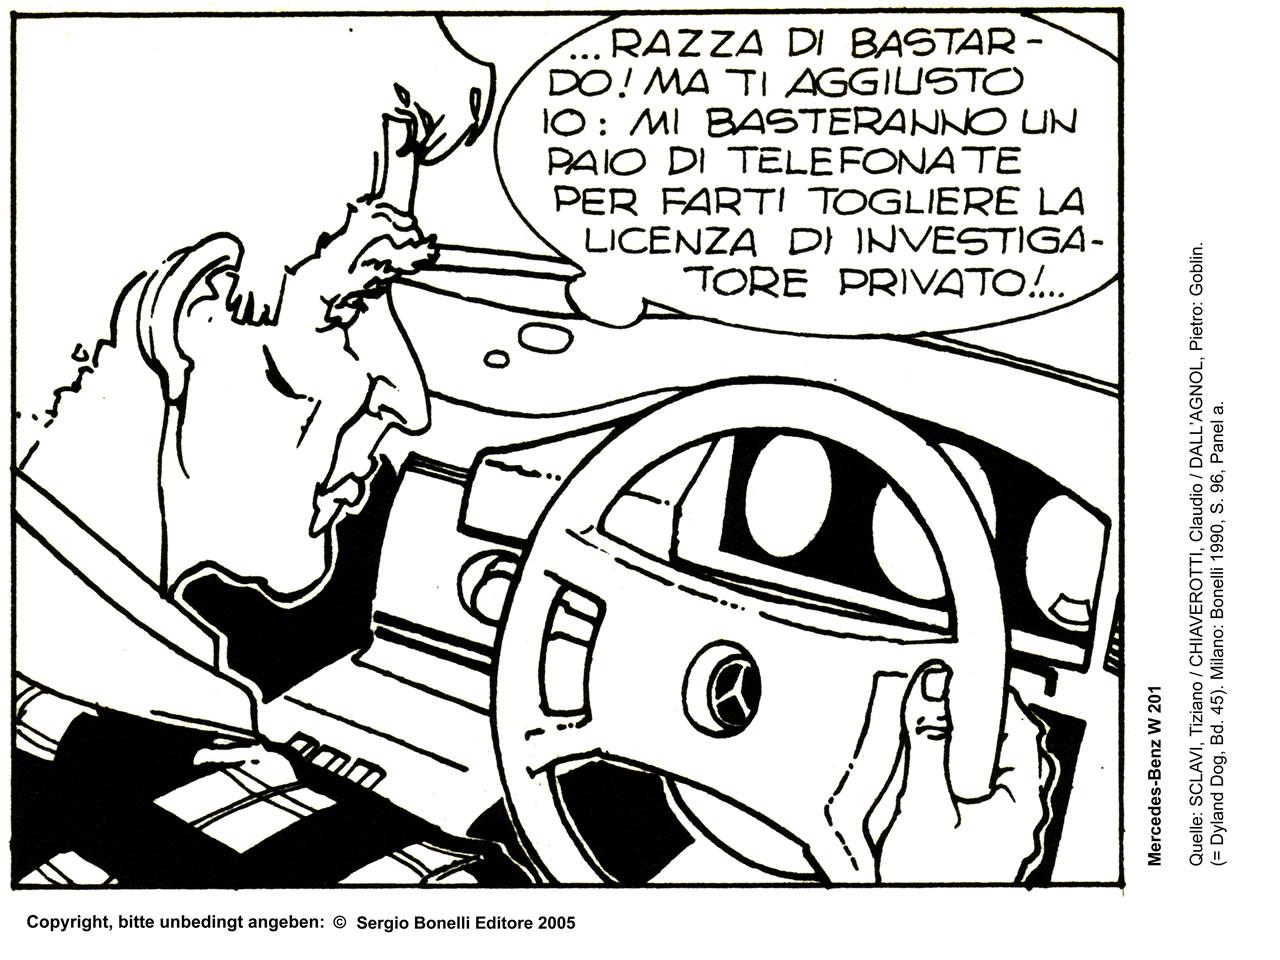 1280x960 Emercedesbenz Feature Mercedes Benz In Comics Emercedesbenz